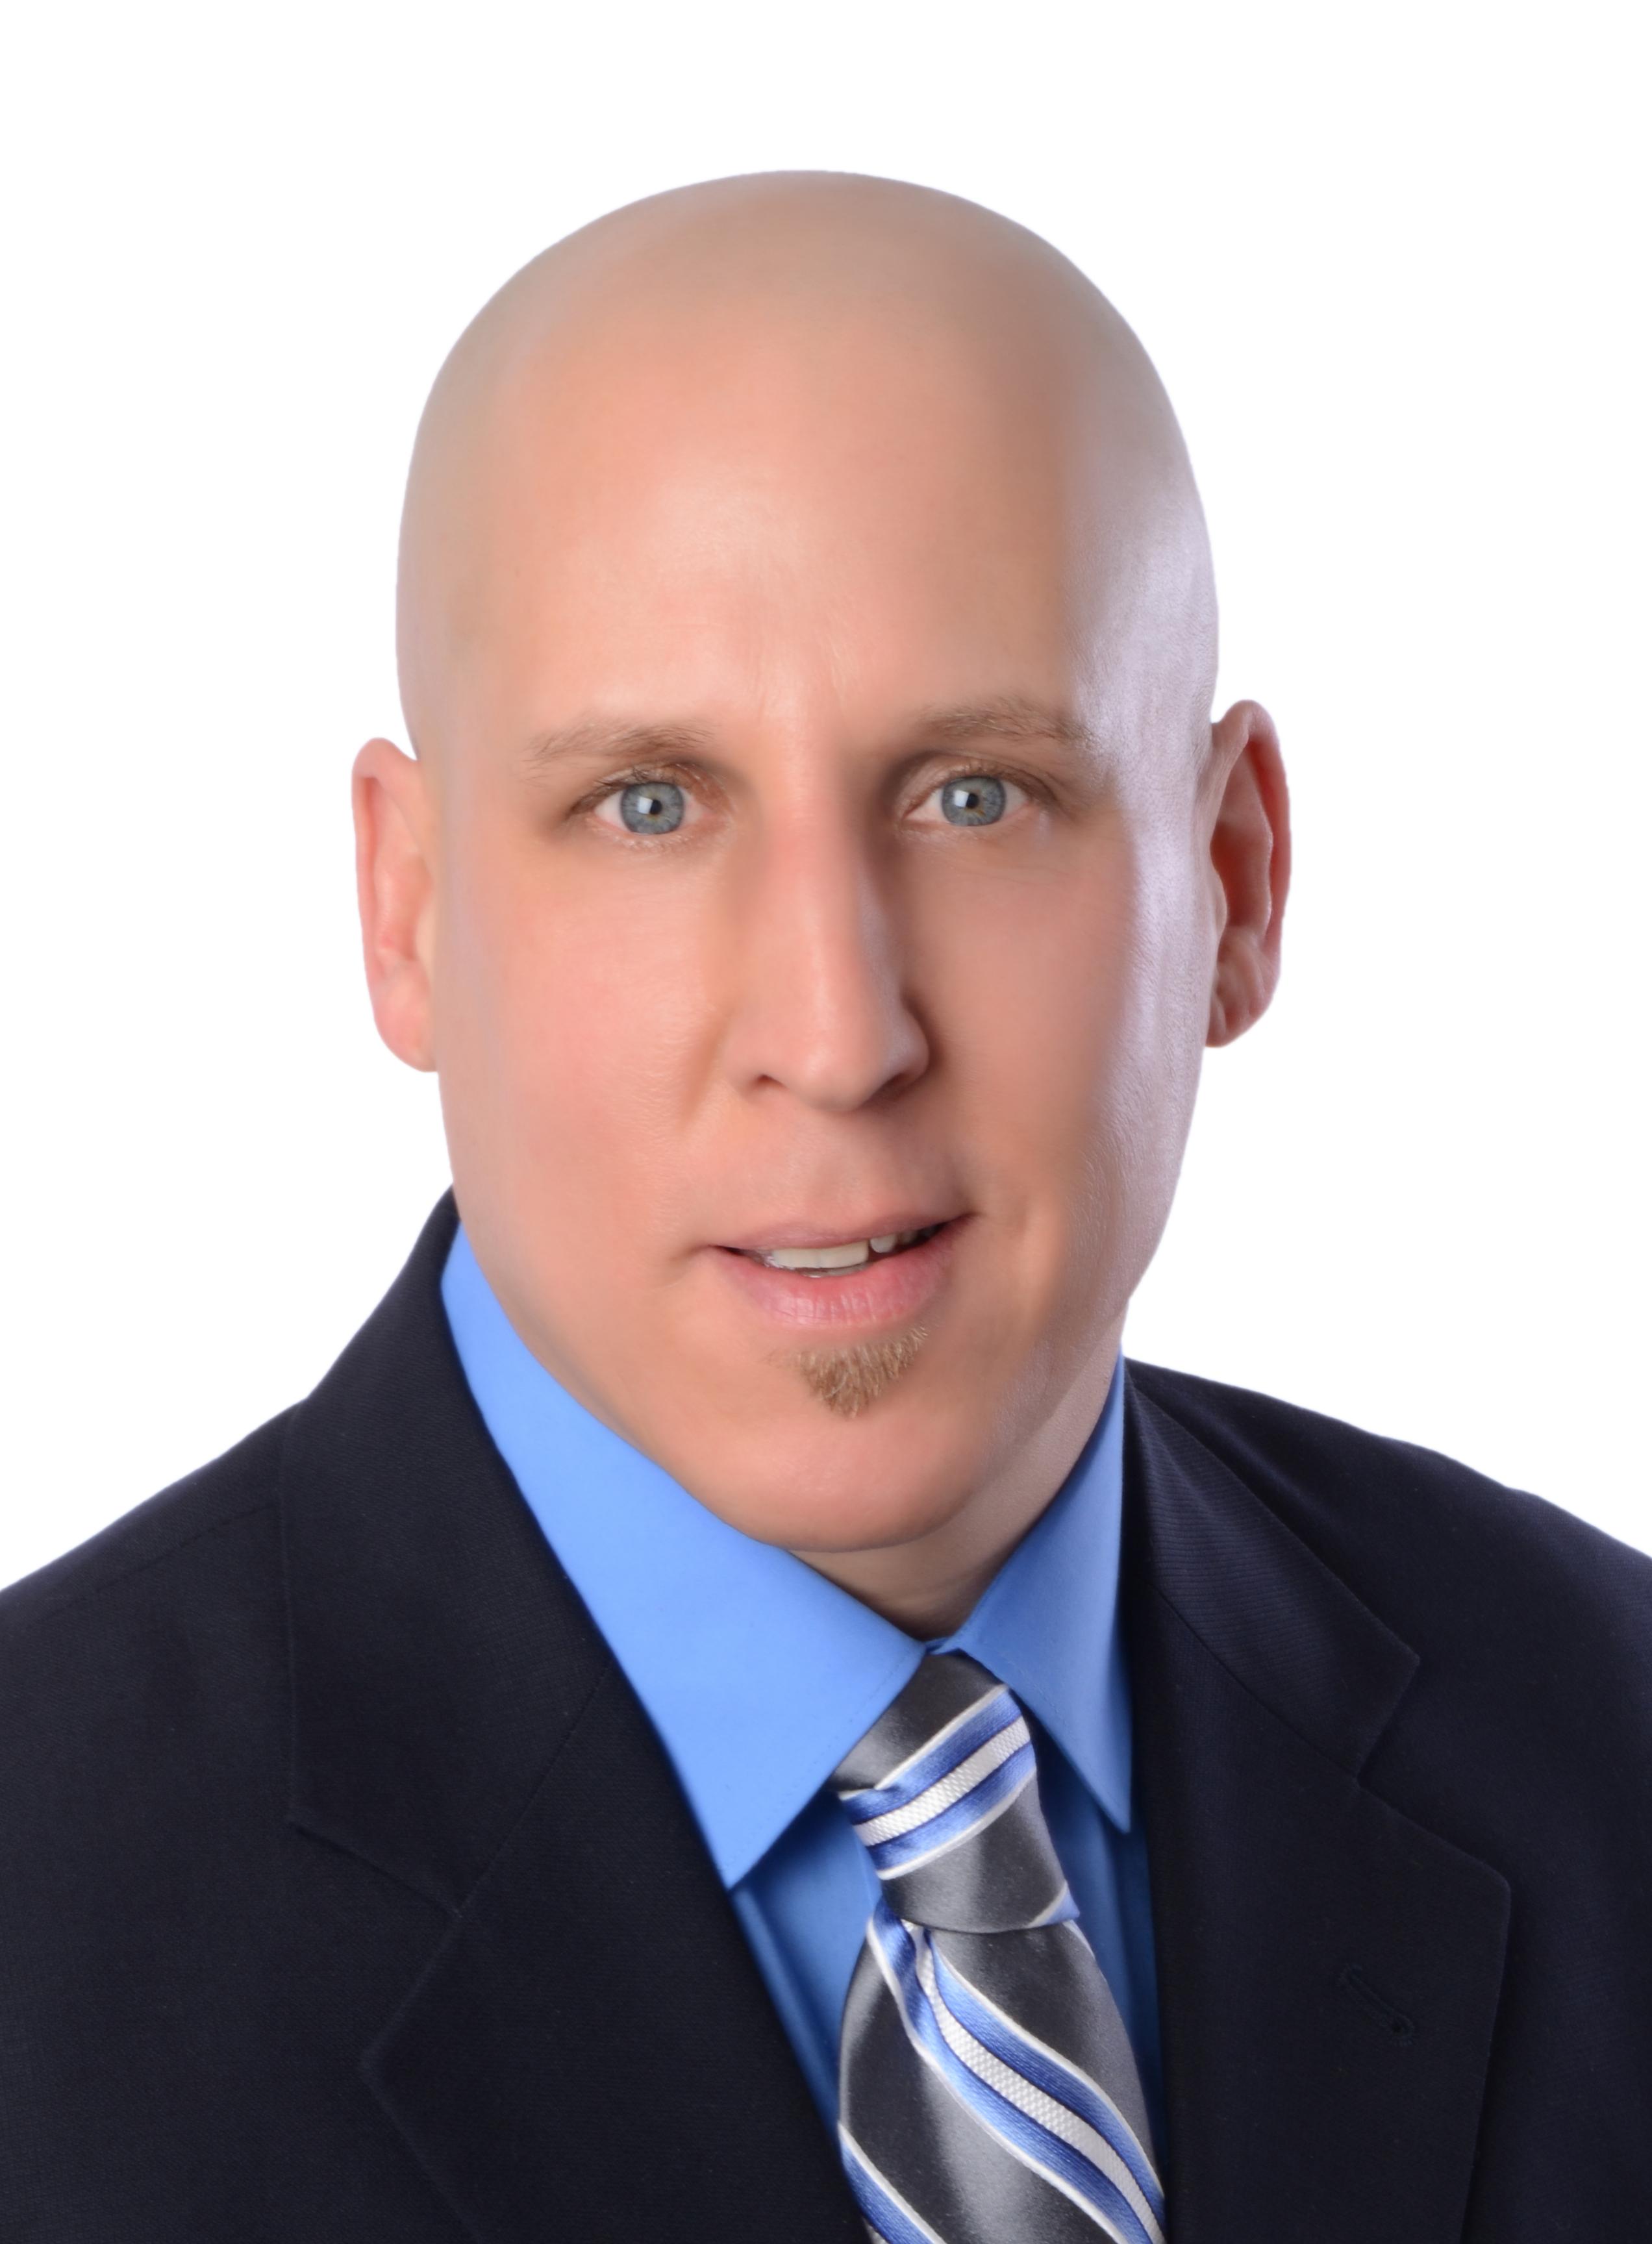 Paul Magyar, Agent in Bronx, NY - 21040230_1424730733_o